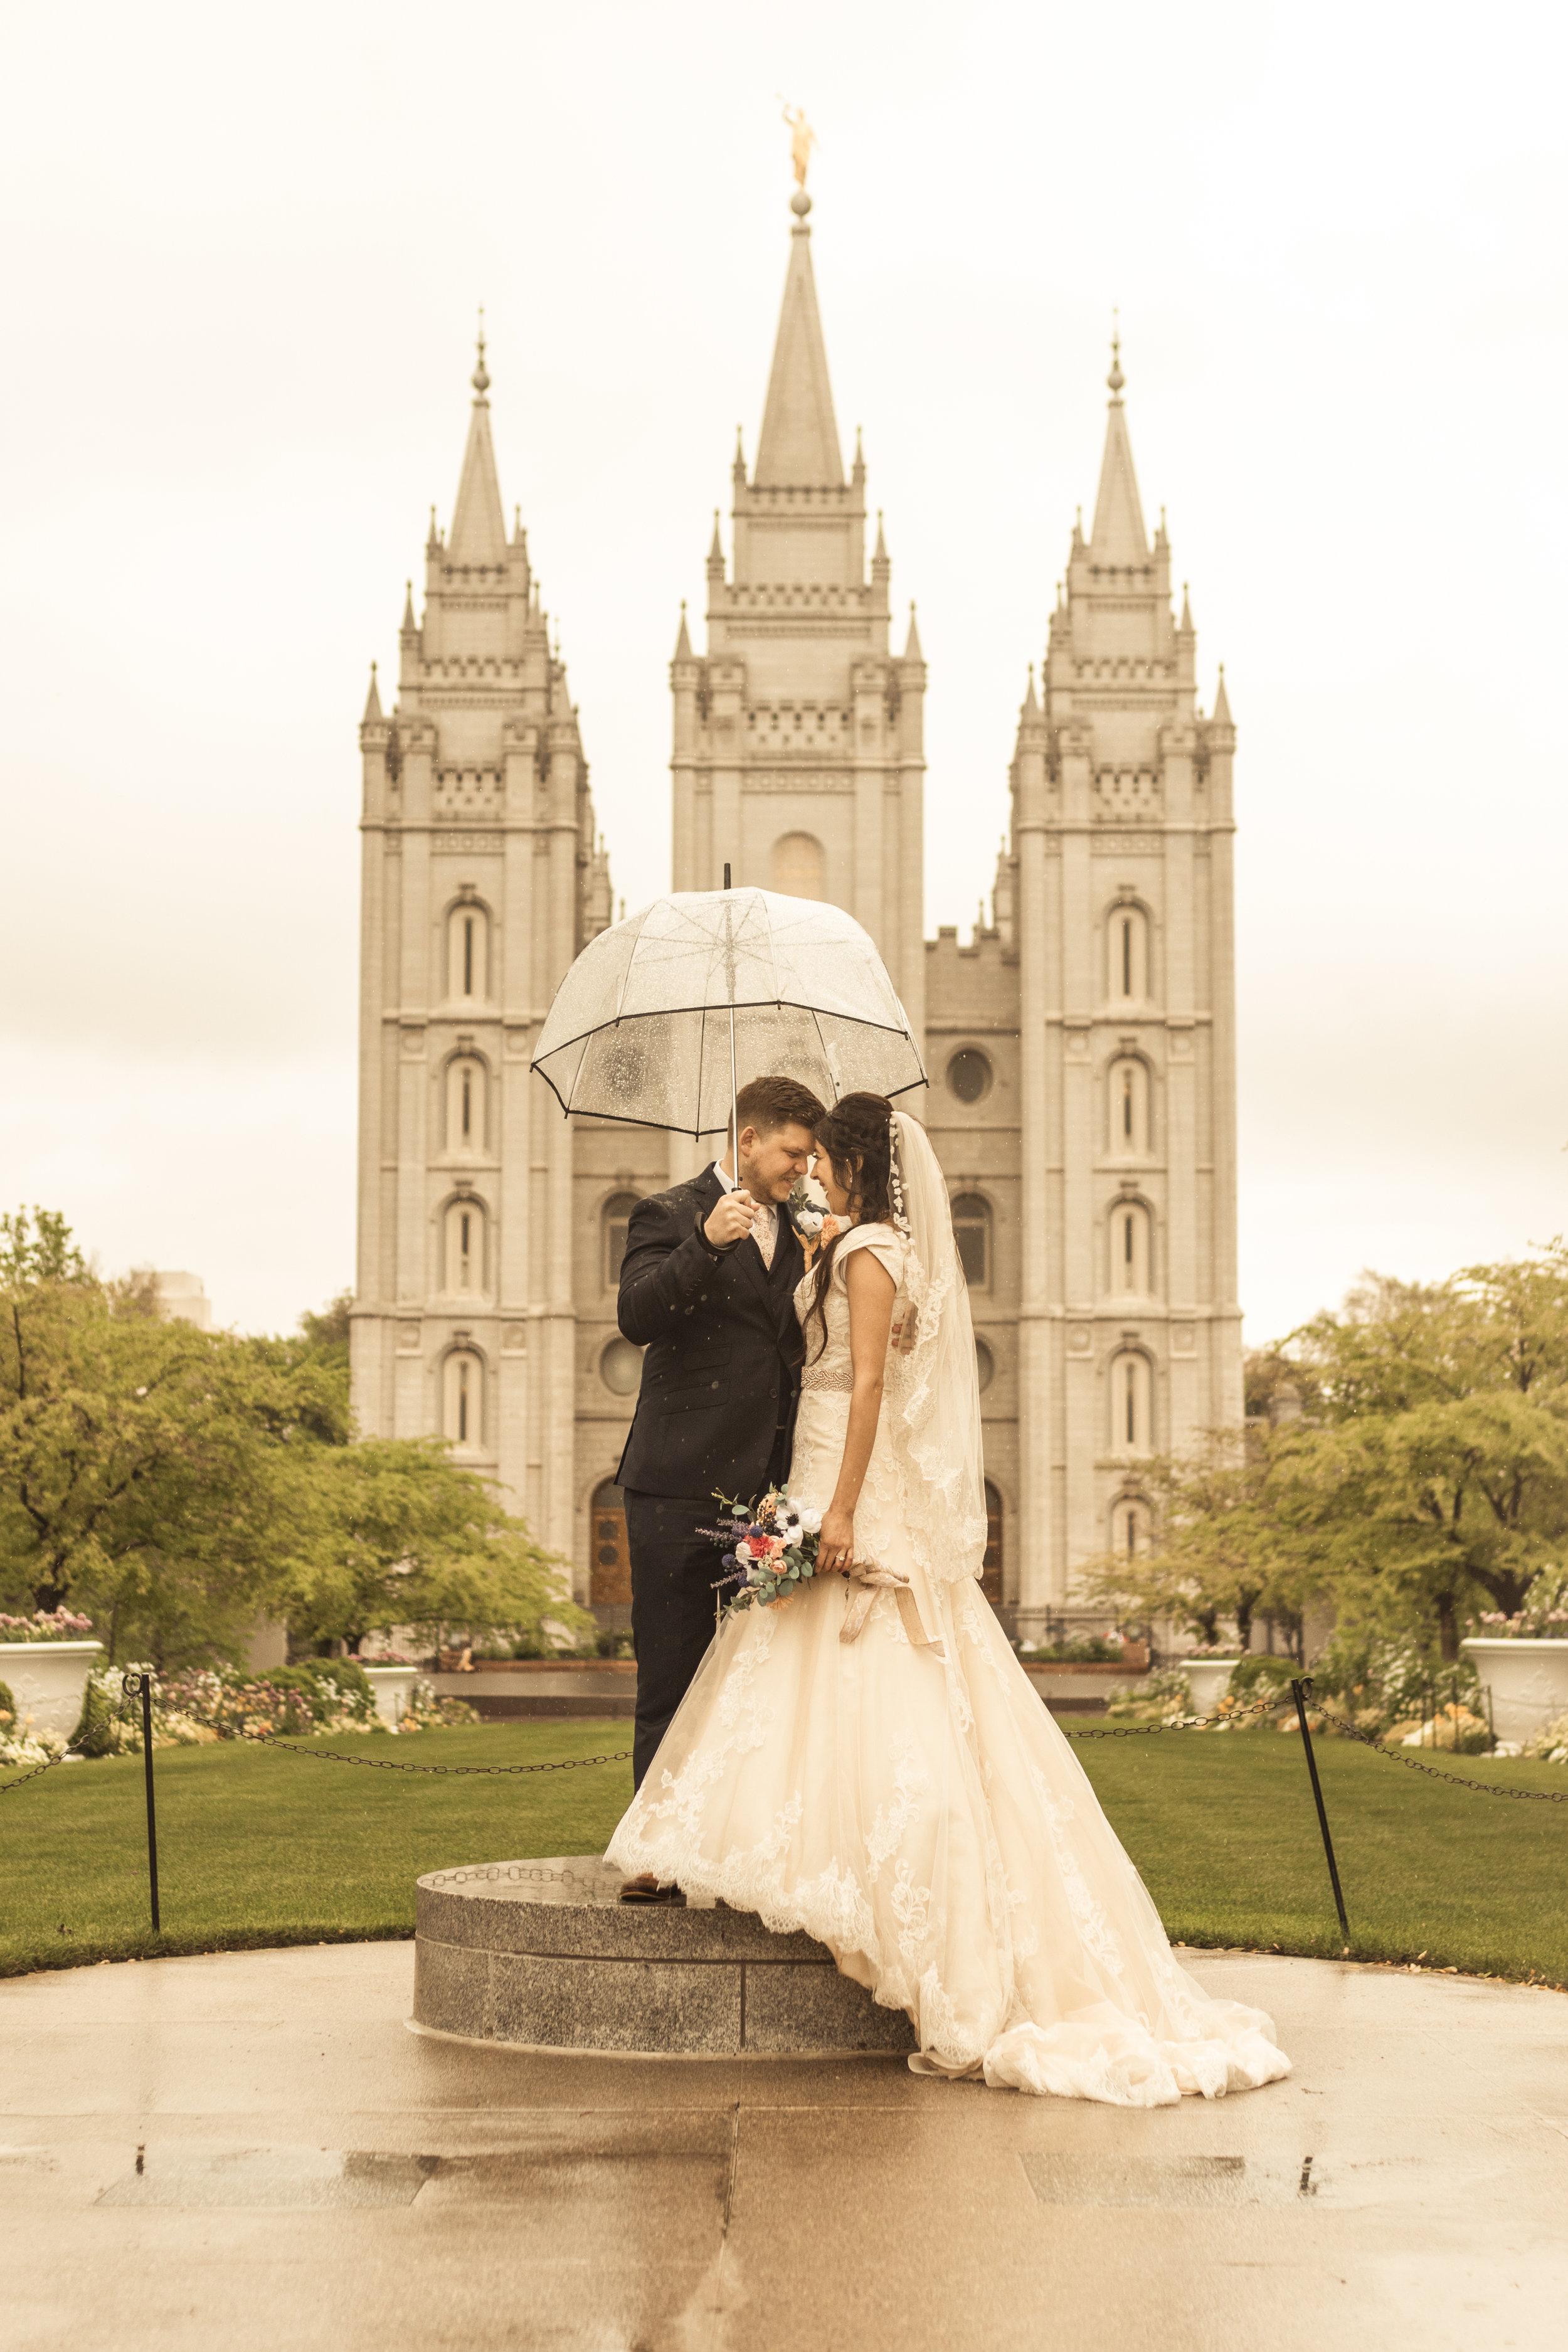 Rainy Spring Wedding at the Salt Lake Templeby Bri Bergman Photography03.JPG